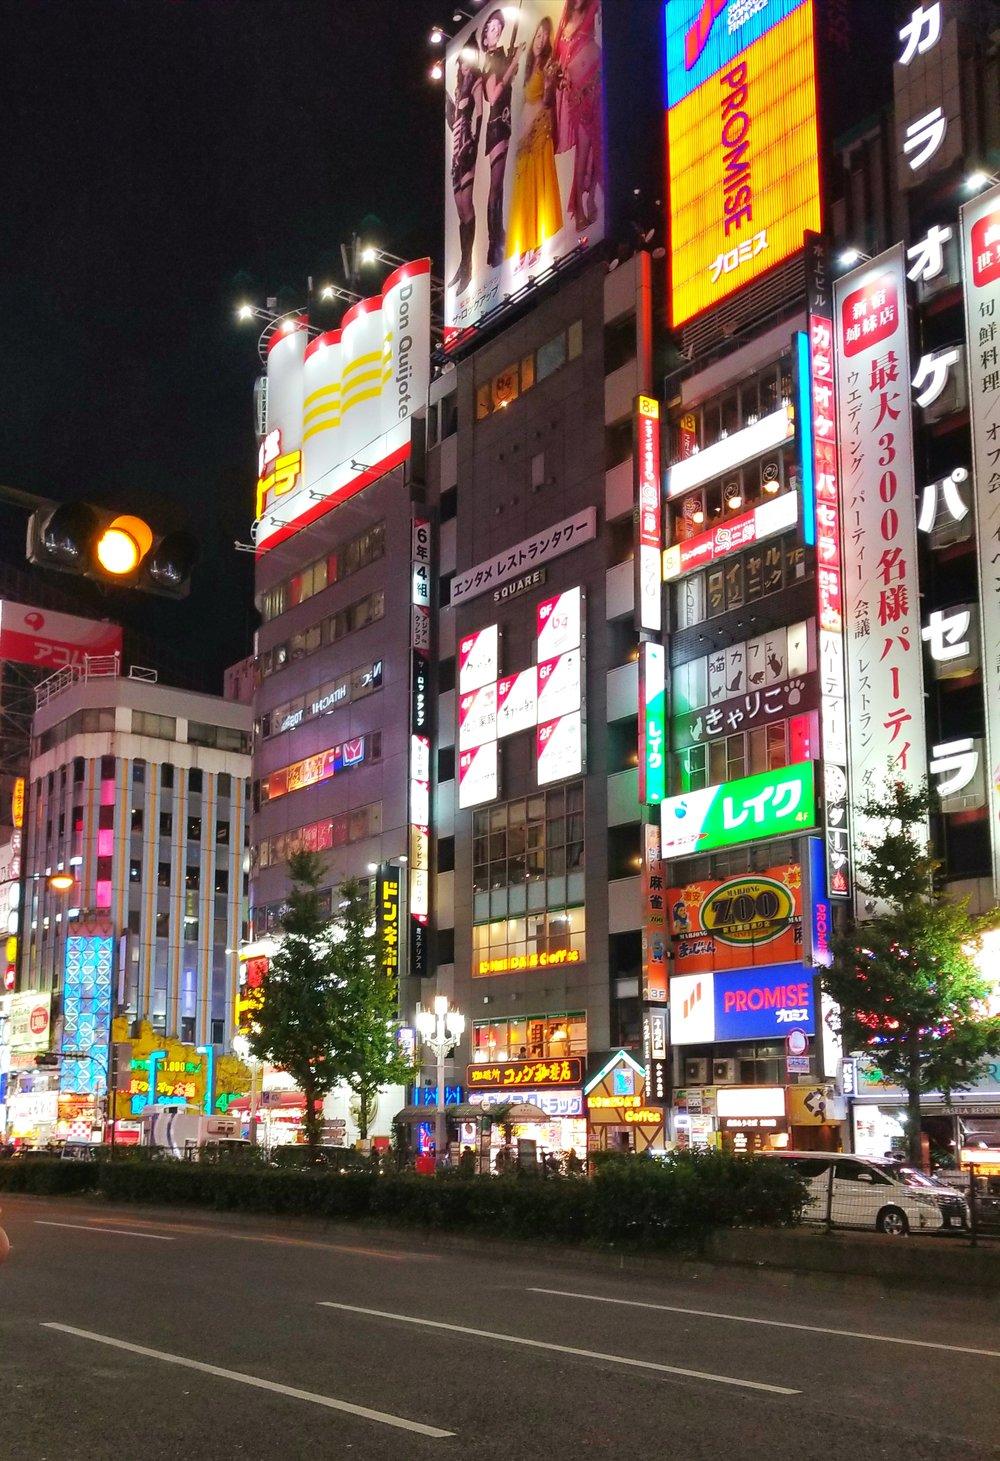 uprooted-traveler-marikart-mario-kart-foolproof-guide-to-tokyo